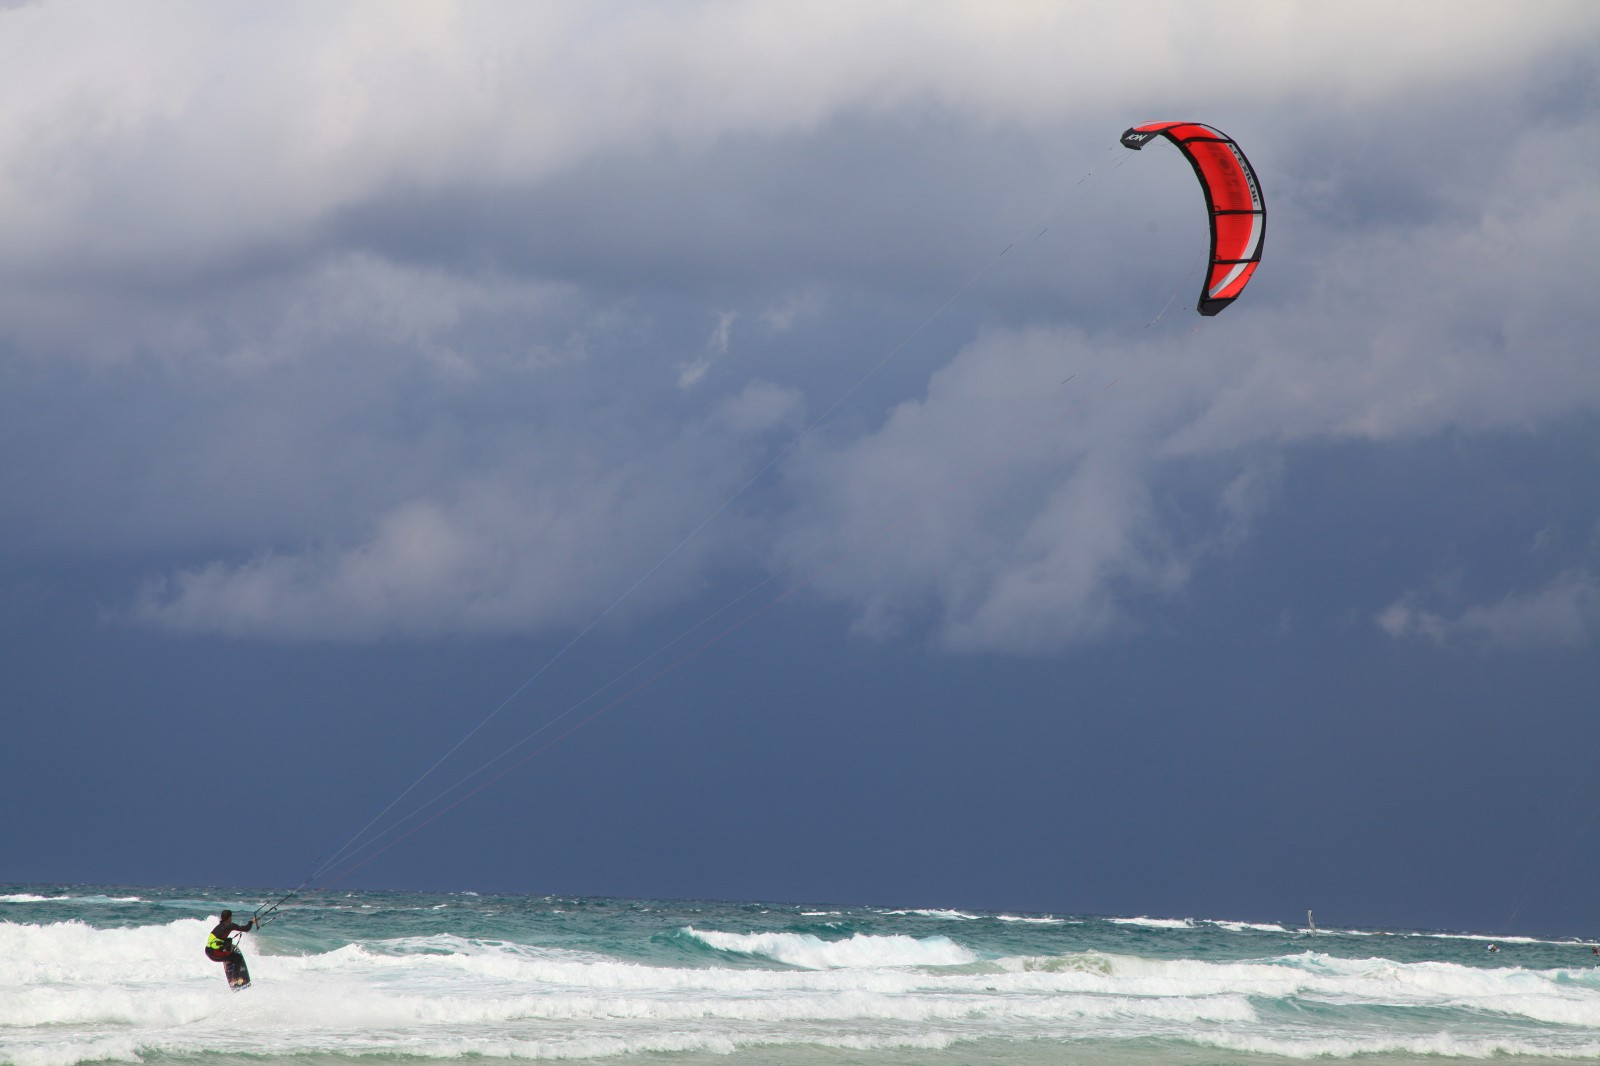 Caesarea beach is popular with kiters